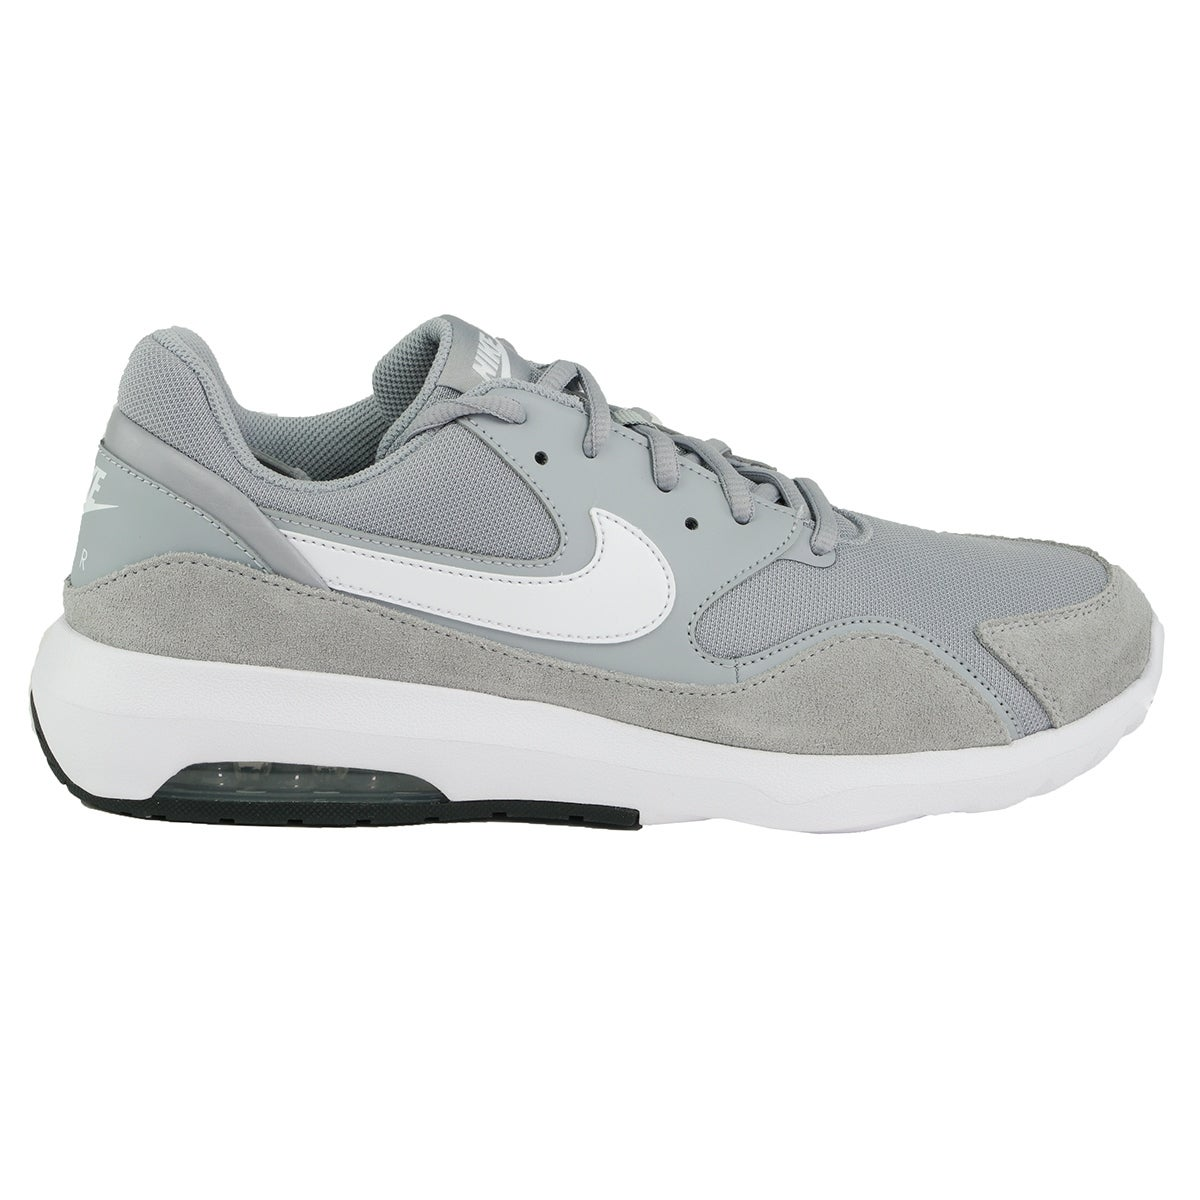 bd9f6c4a6861 Size 7 Nike Men s Shoes